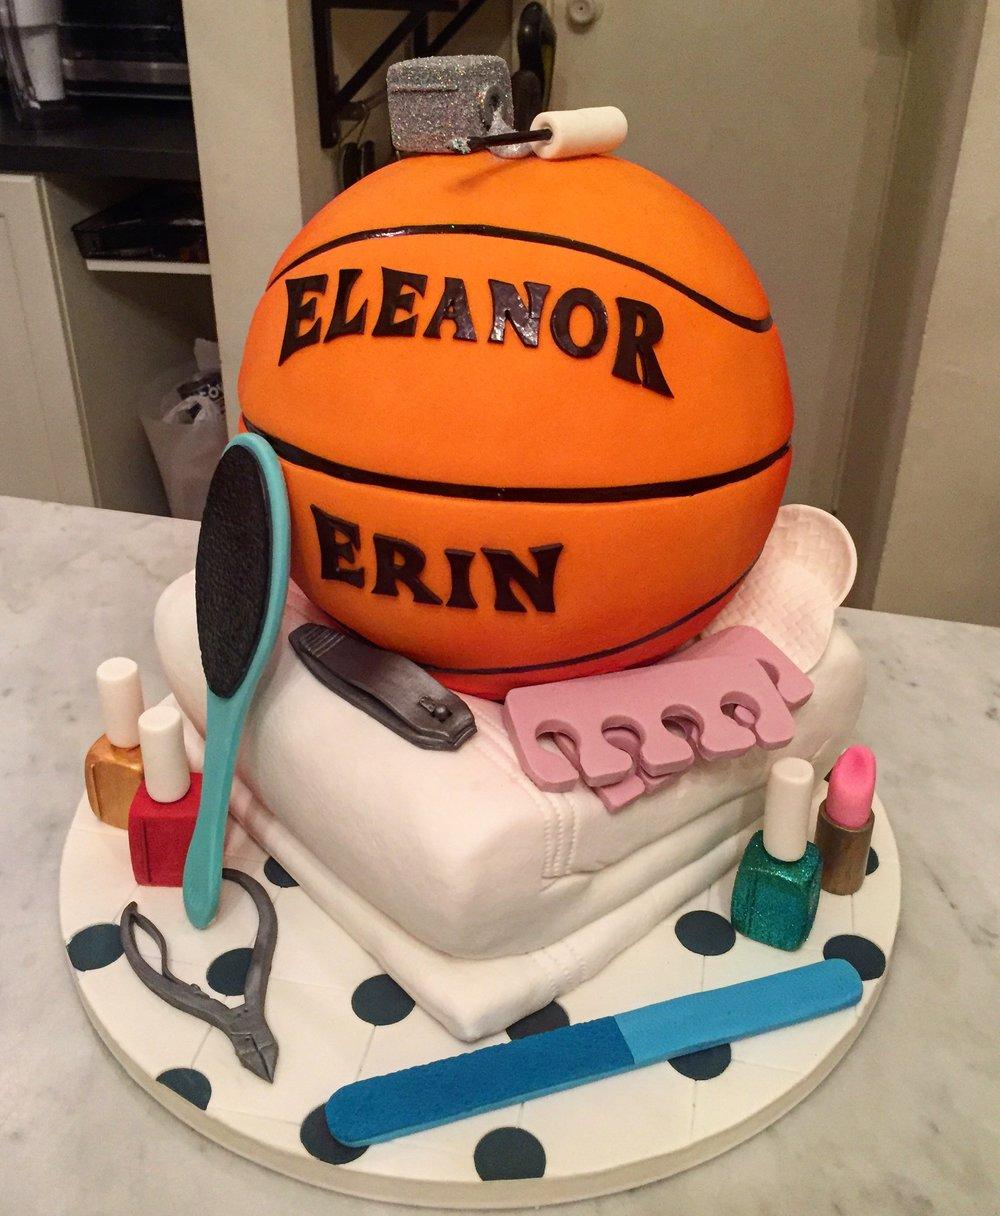 Eleanor Cake 7.JPG